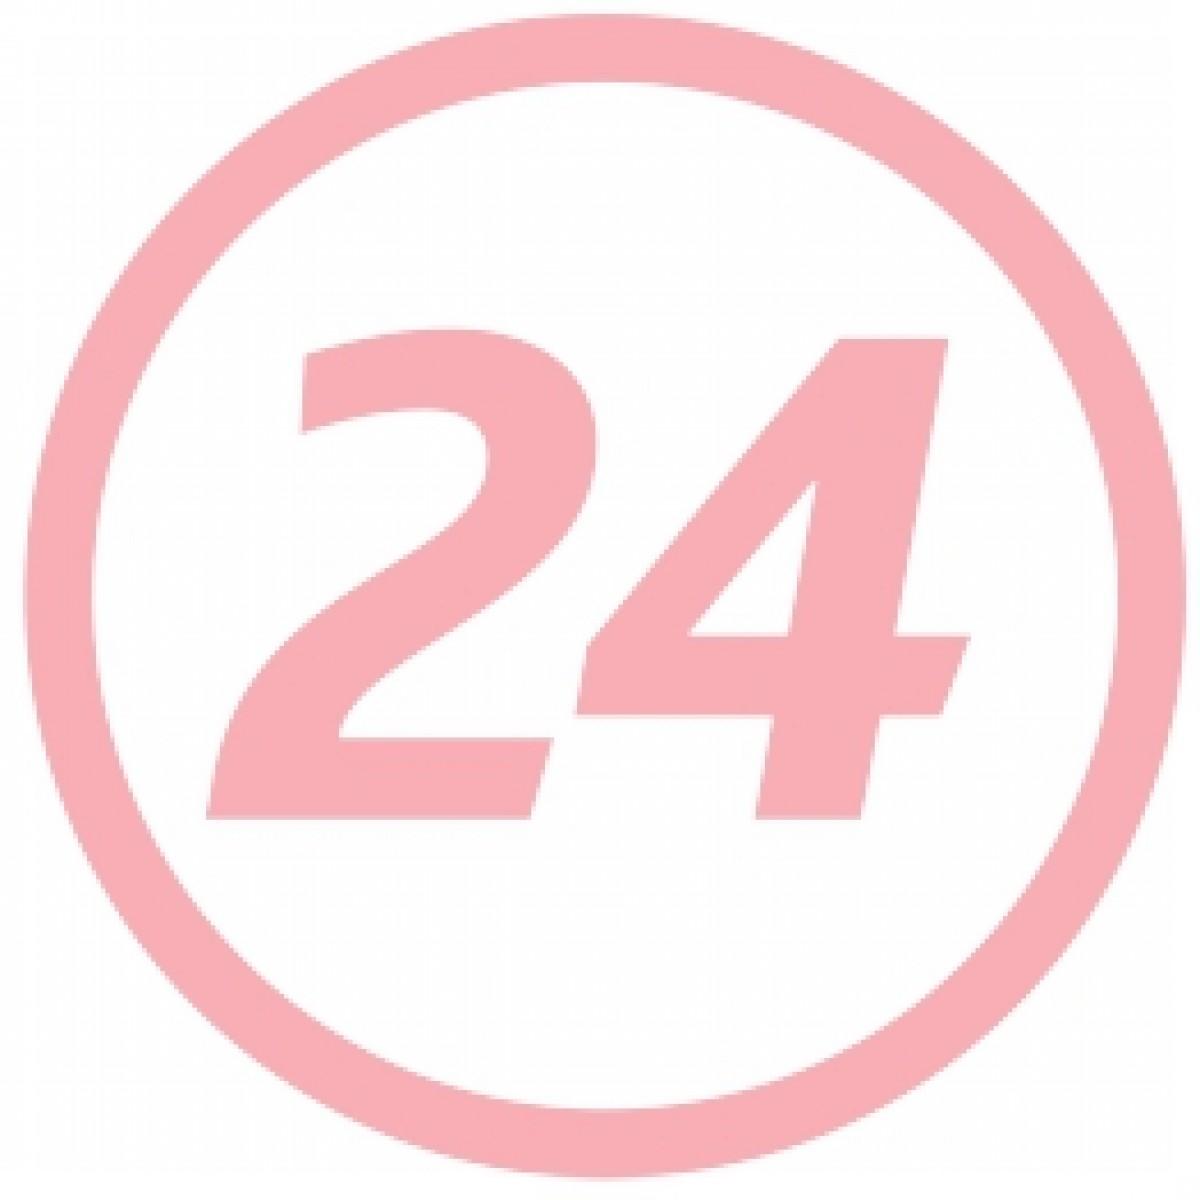 VICHY Deodorant Stick 24h, Efect de Piele Uscata, Stick, 40ml